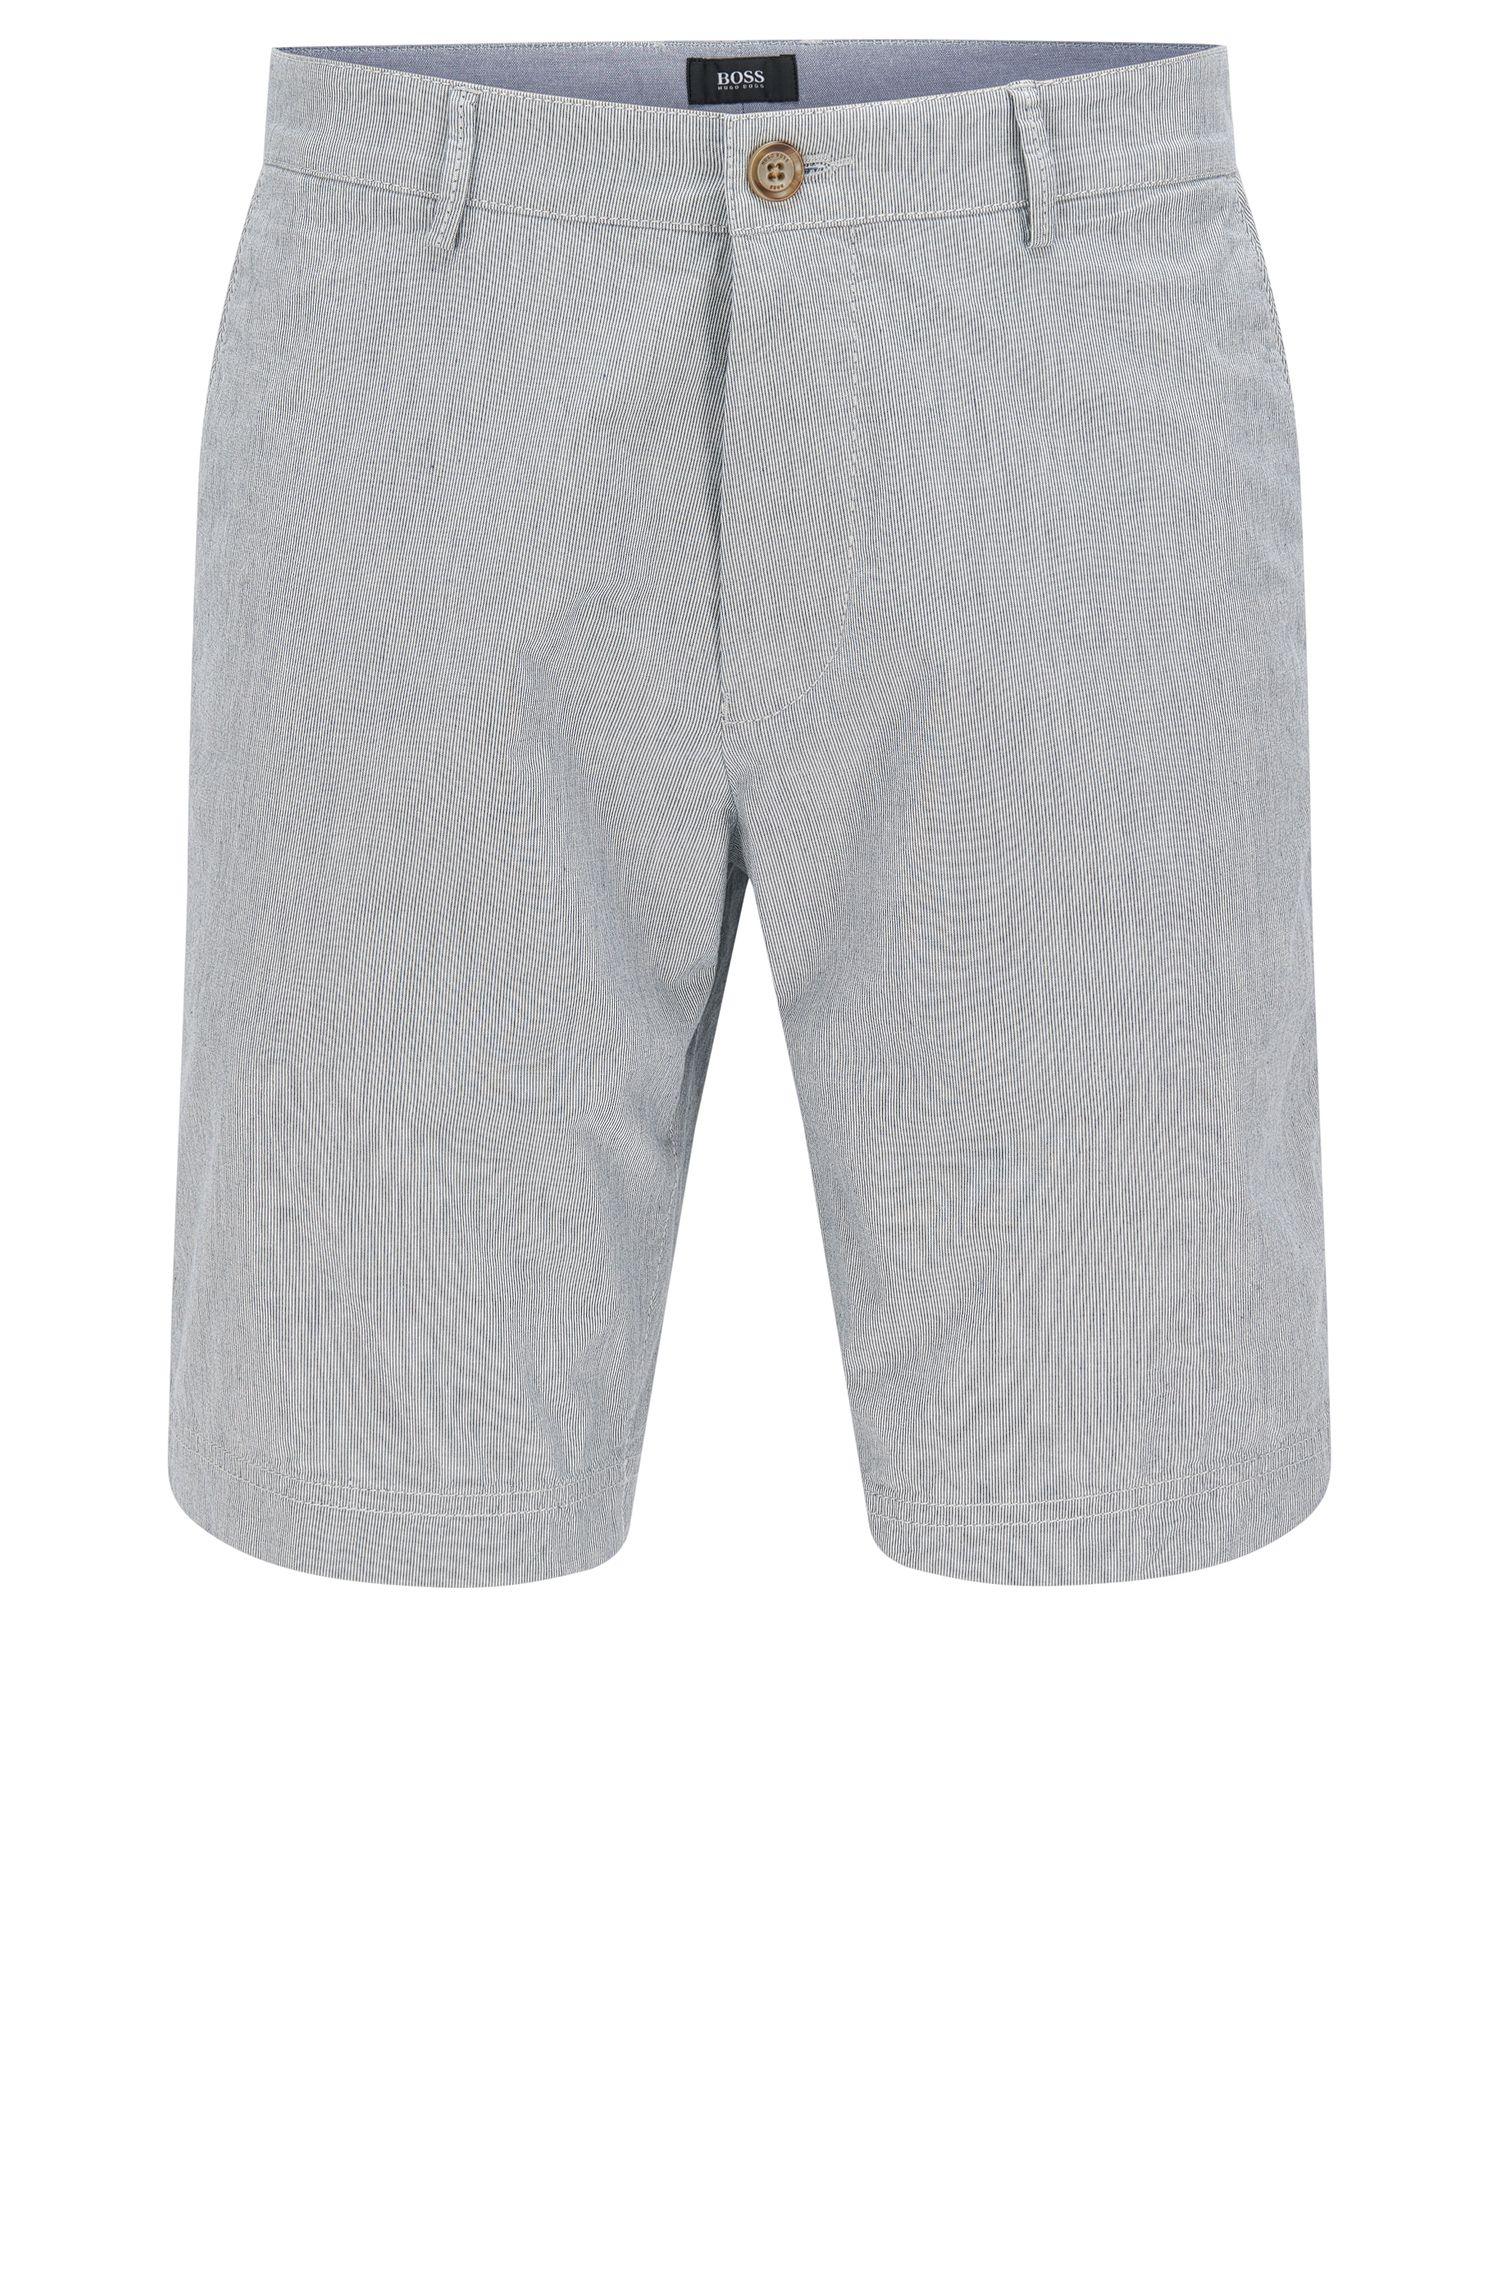 Shorts regular fit en algodón elástico: 'Crigan-Short-W'